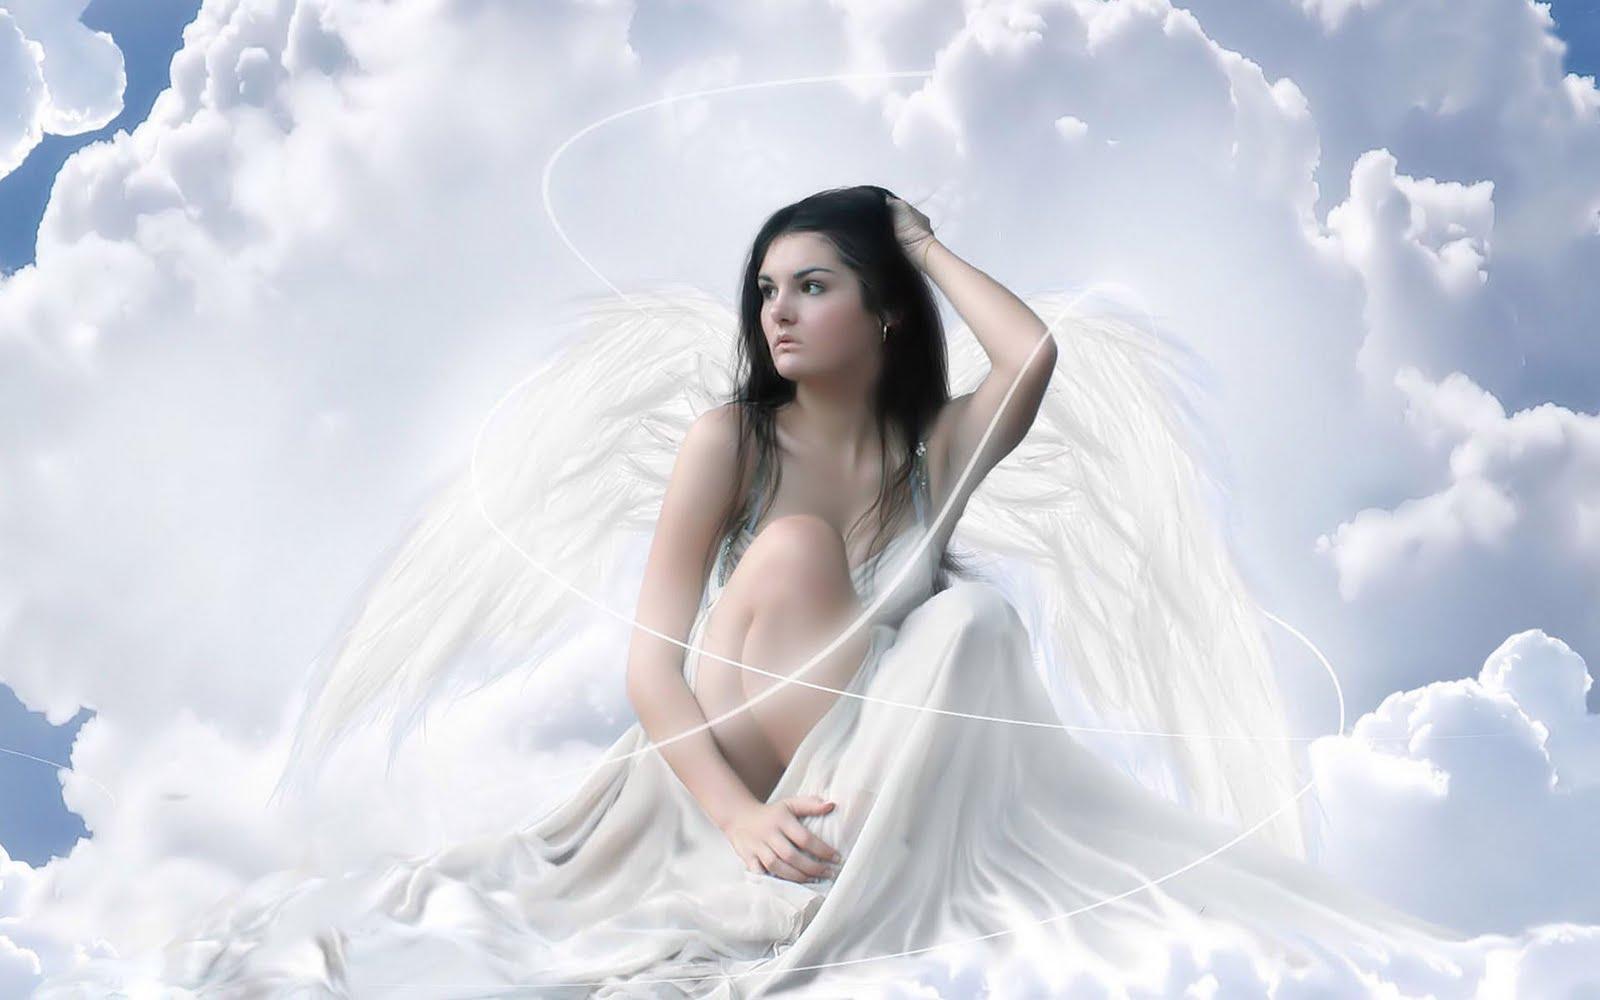 http://4.bp.blogspot.com/-WXkqWhYZI3c/Tp2RAfDP41I/AAAAAAAABfU/SWuFVeI6mog/s1600/fantasy_girl_18-wide-hd-wallpapers-wallpape.in.jpg